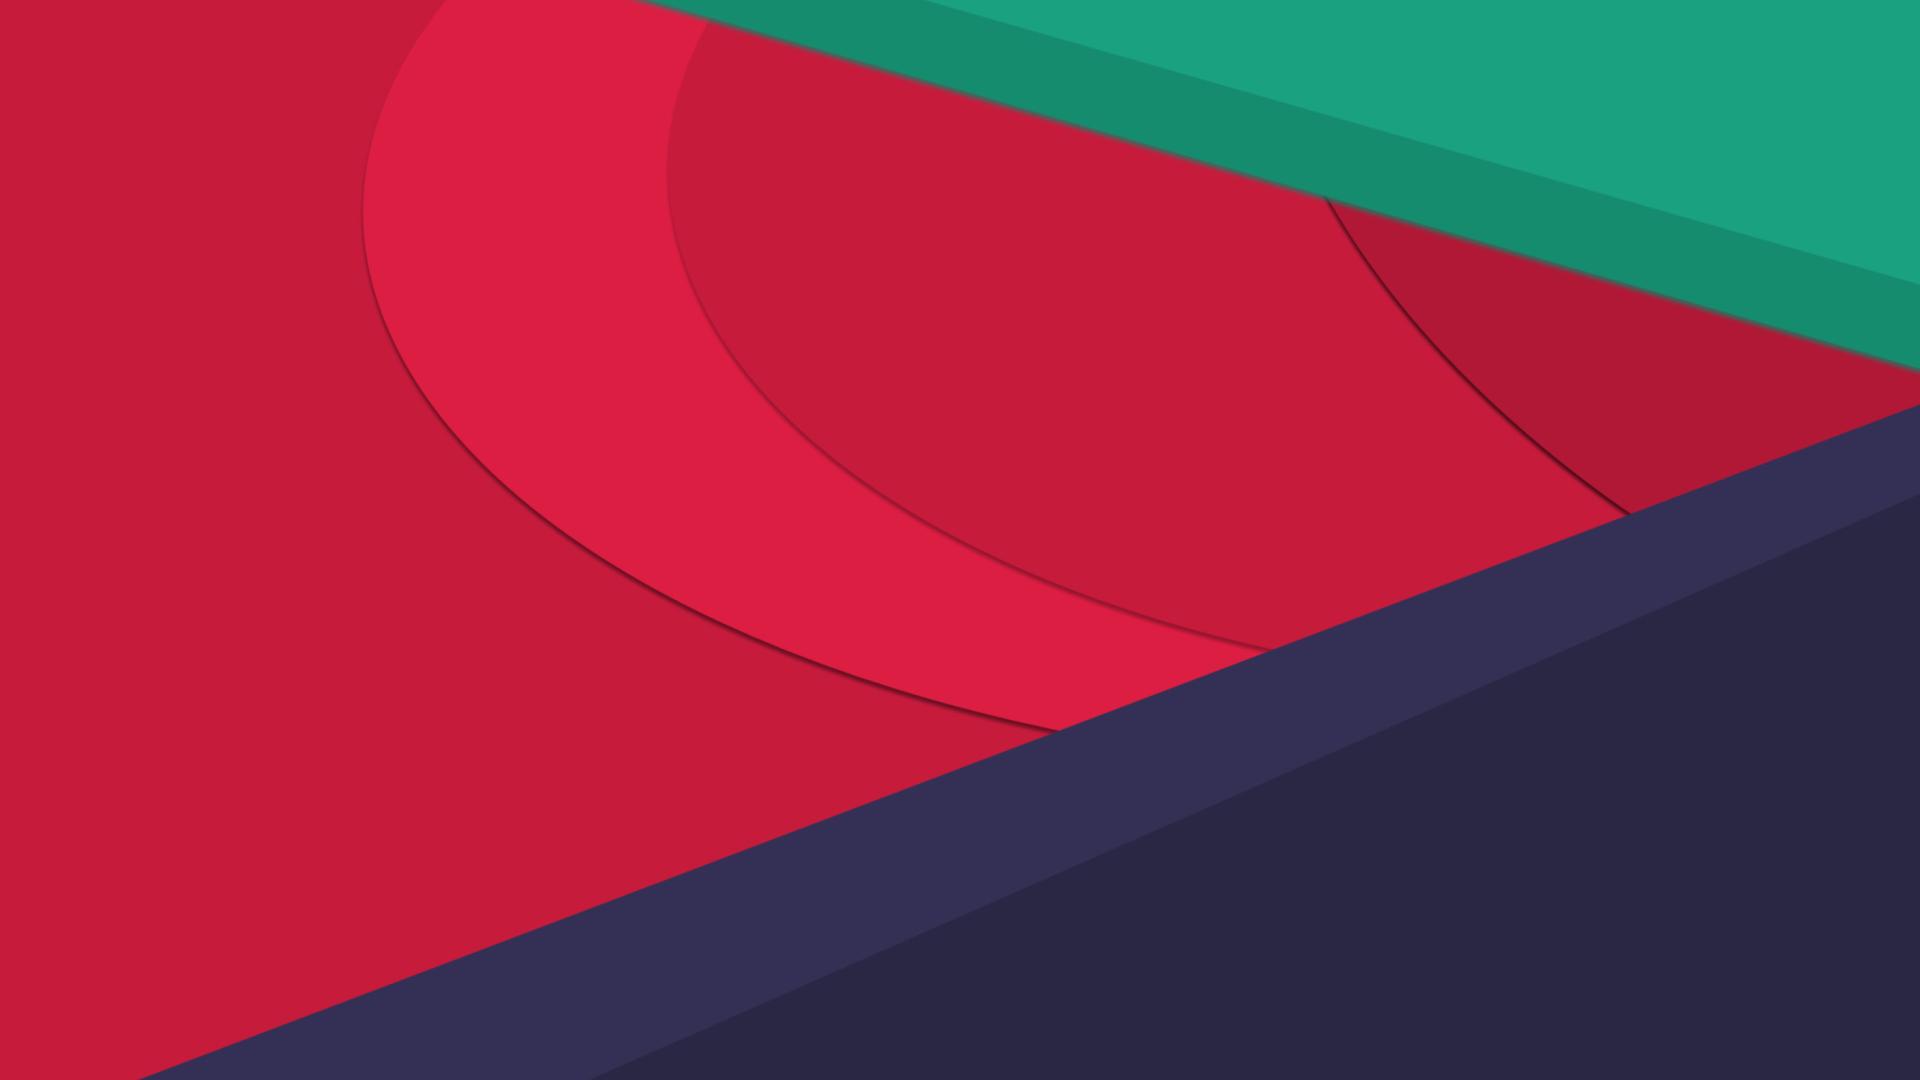 Android kitkat fondos de pantalla gratis para escritorio for Fondos de pantalla para android gratis